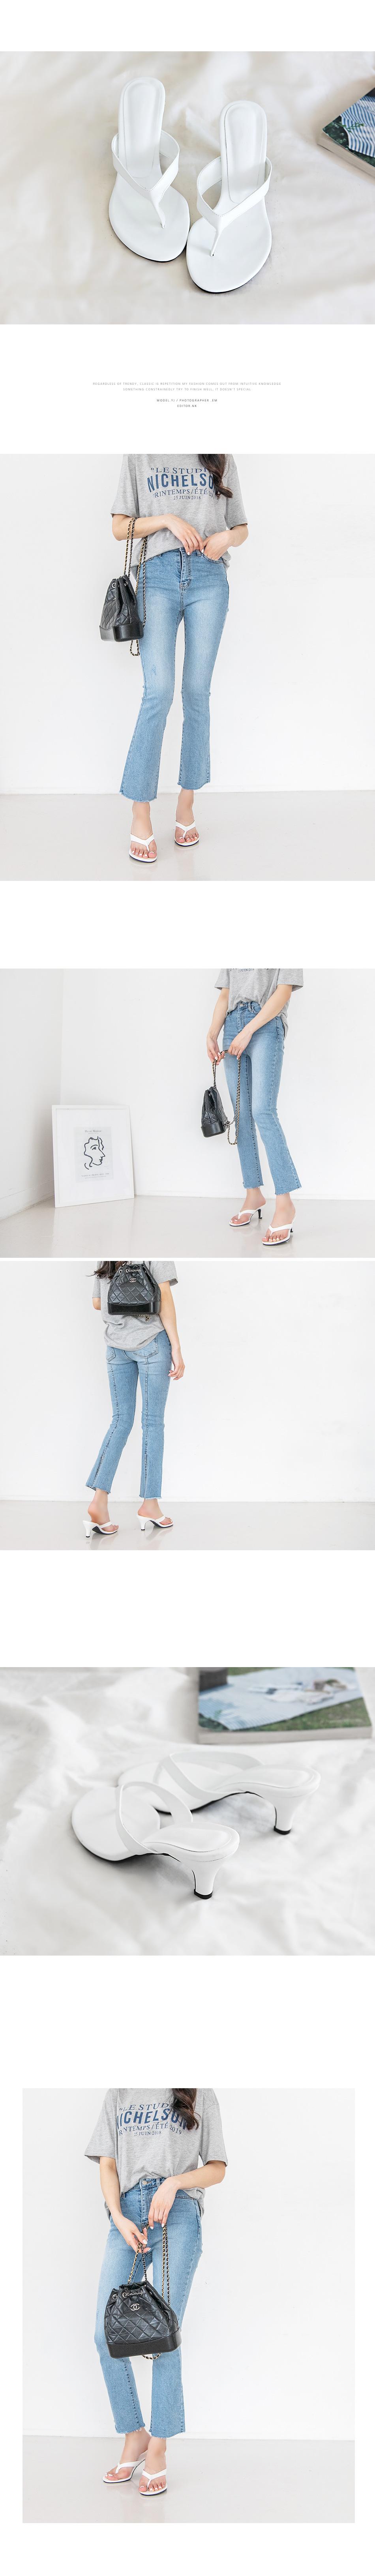 Irene Sasuri Mule Slippers 6cm